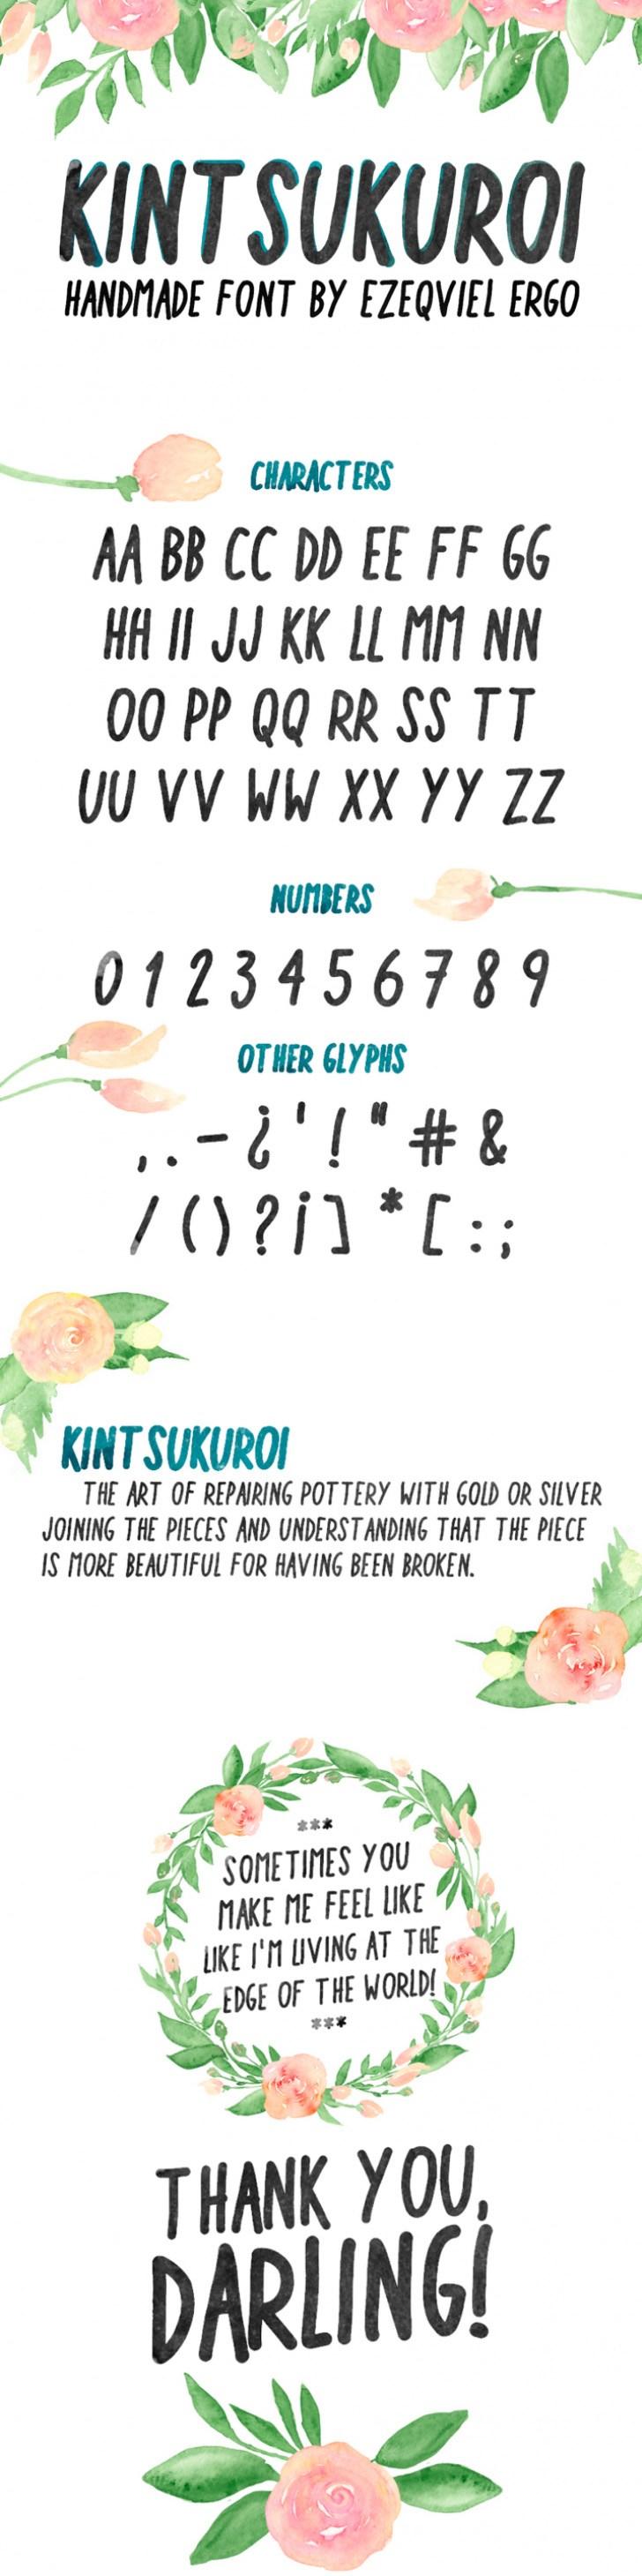 https://fontclarity.com/wp-content/uploads/2019/09/kintsukuroi-download-0.jpg Free Download